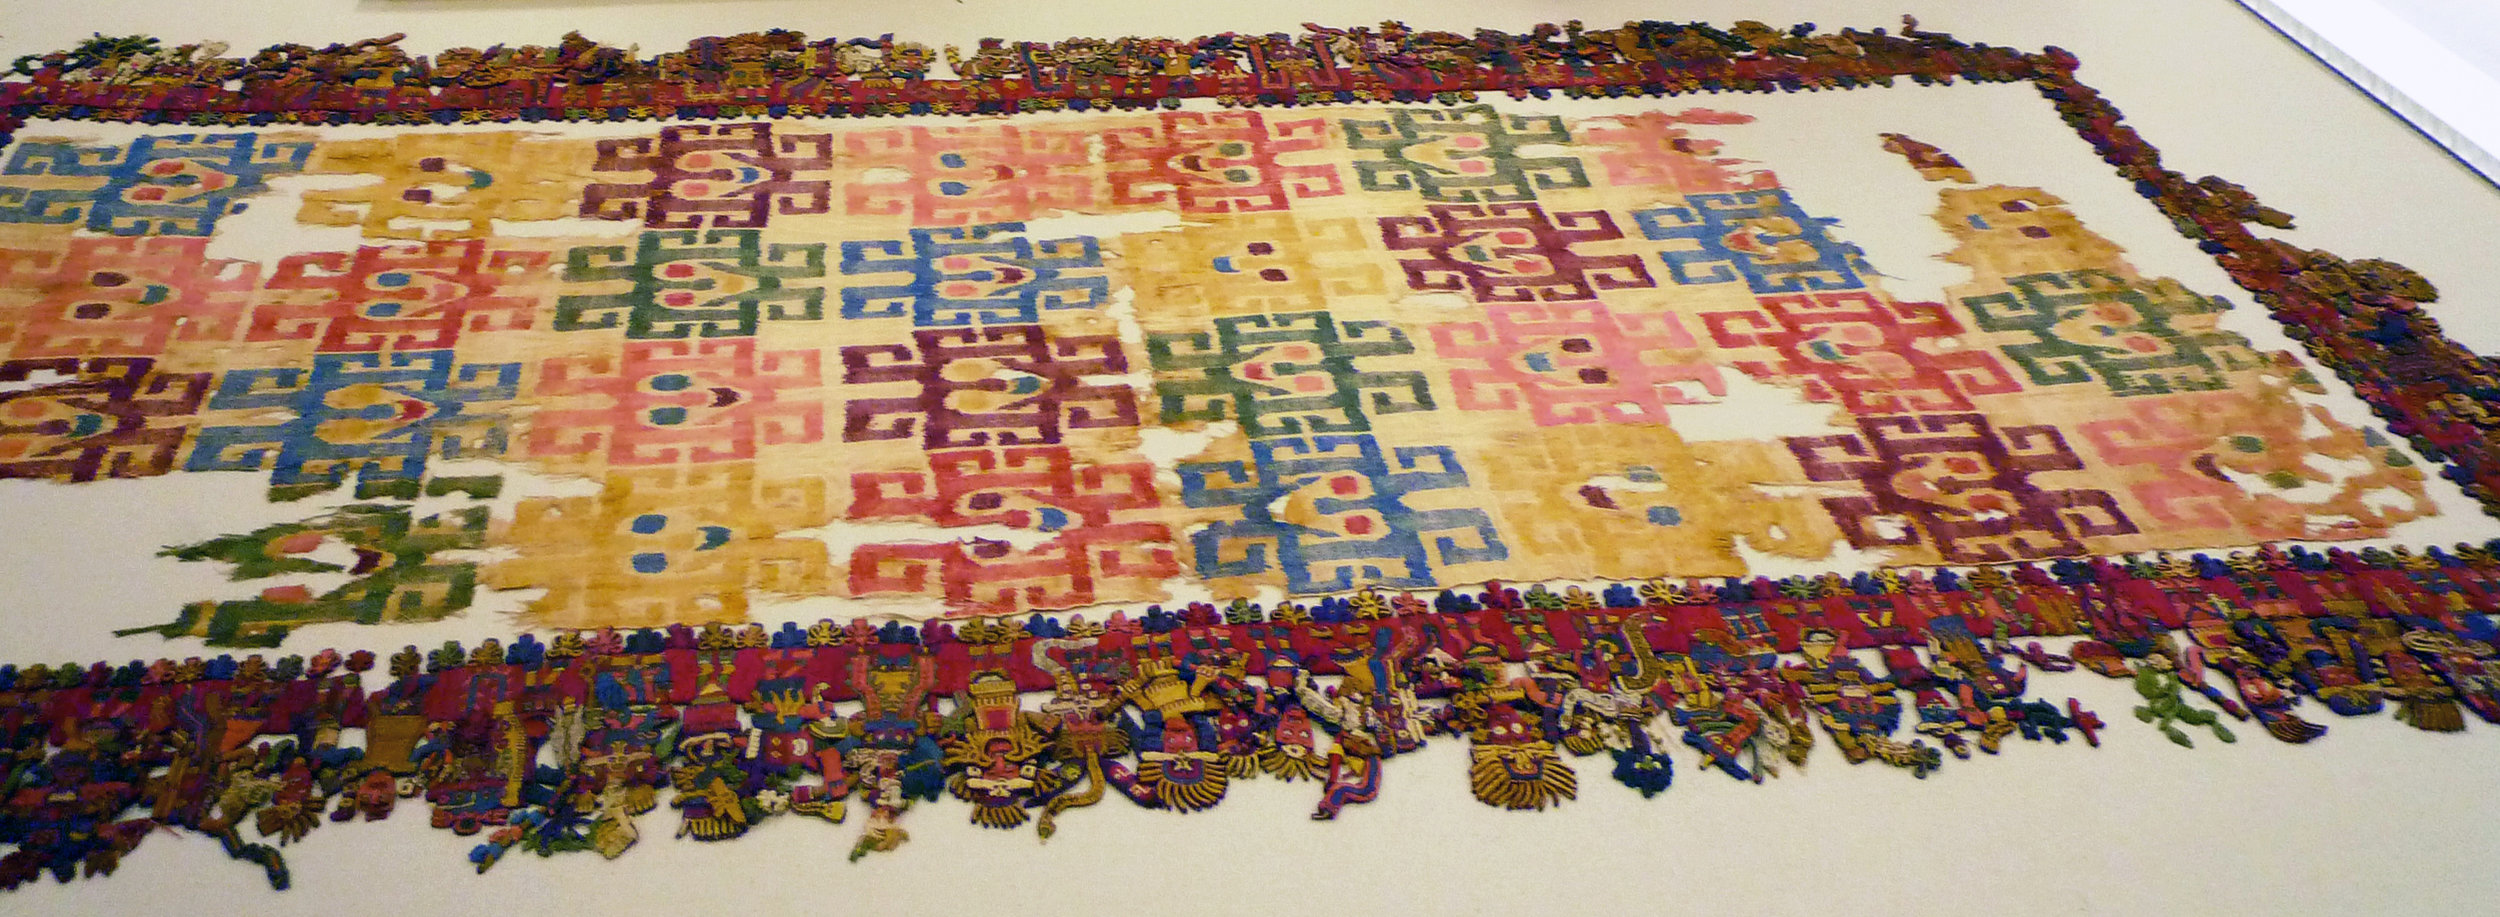 Paracas Textile.jpg